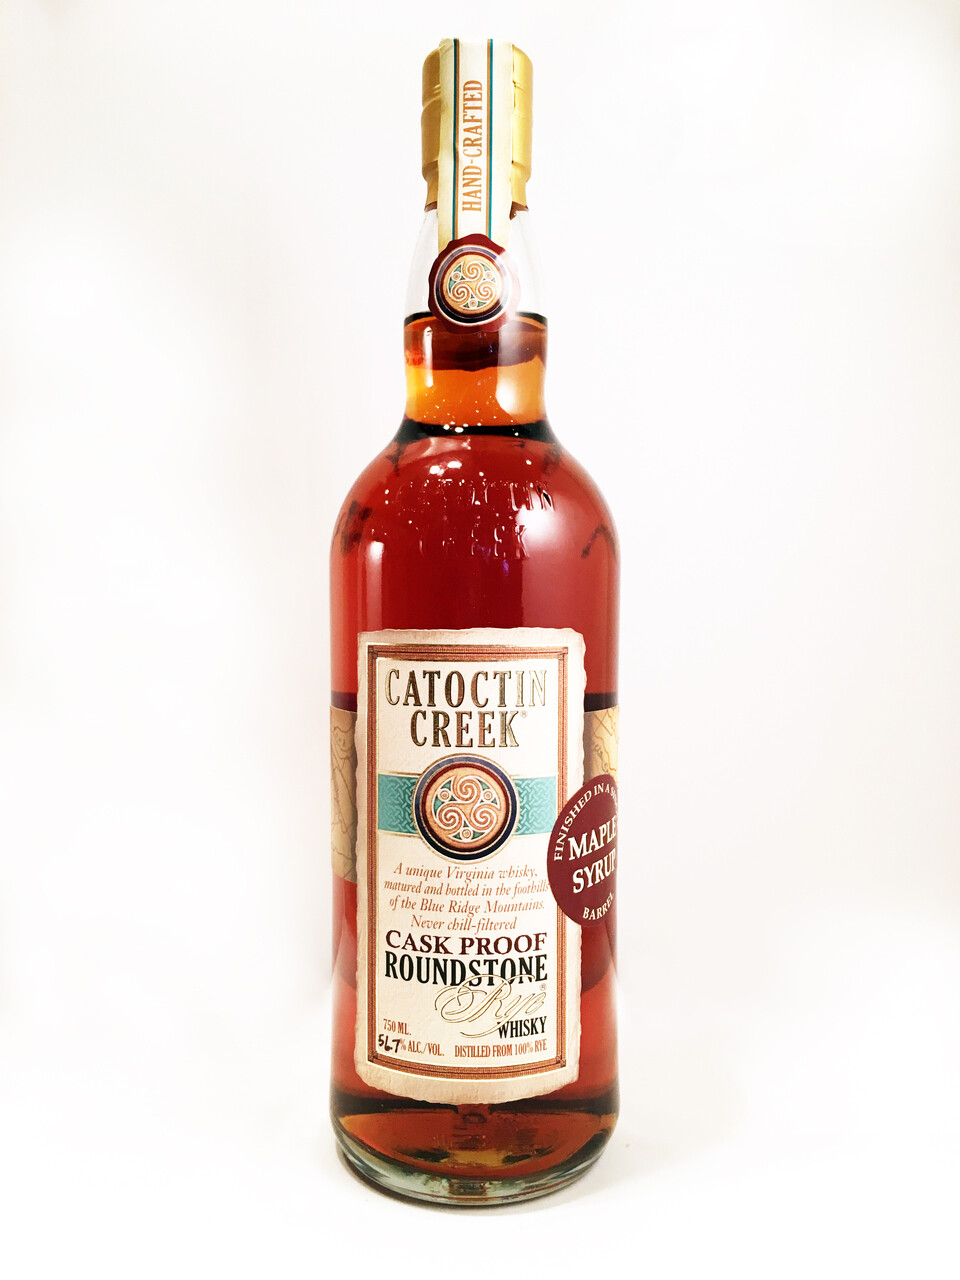 Catoctin Creek Roundstone Rye, Maple Syrup Finish (114.6 proof)